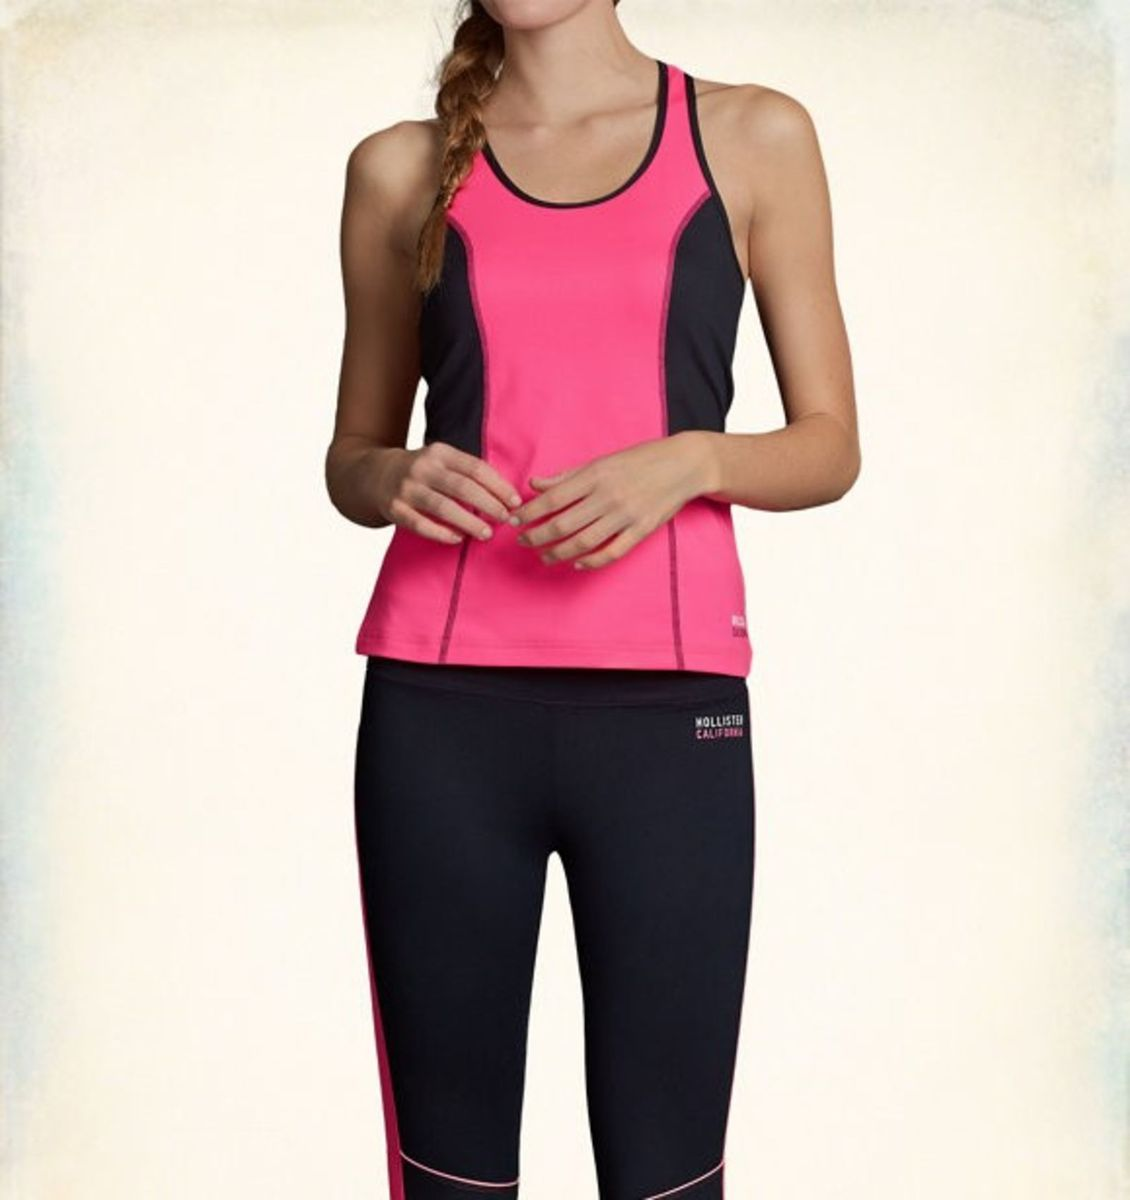 blusinha fitness hollister regata academia malhação sport - camisetas  hollister 50d402ea1c5